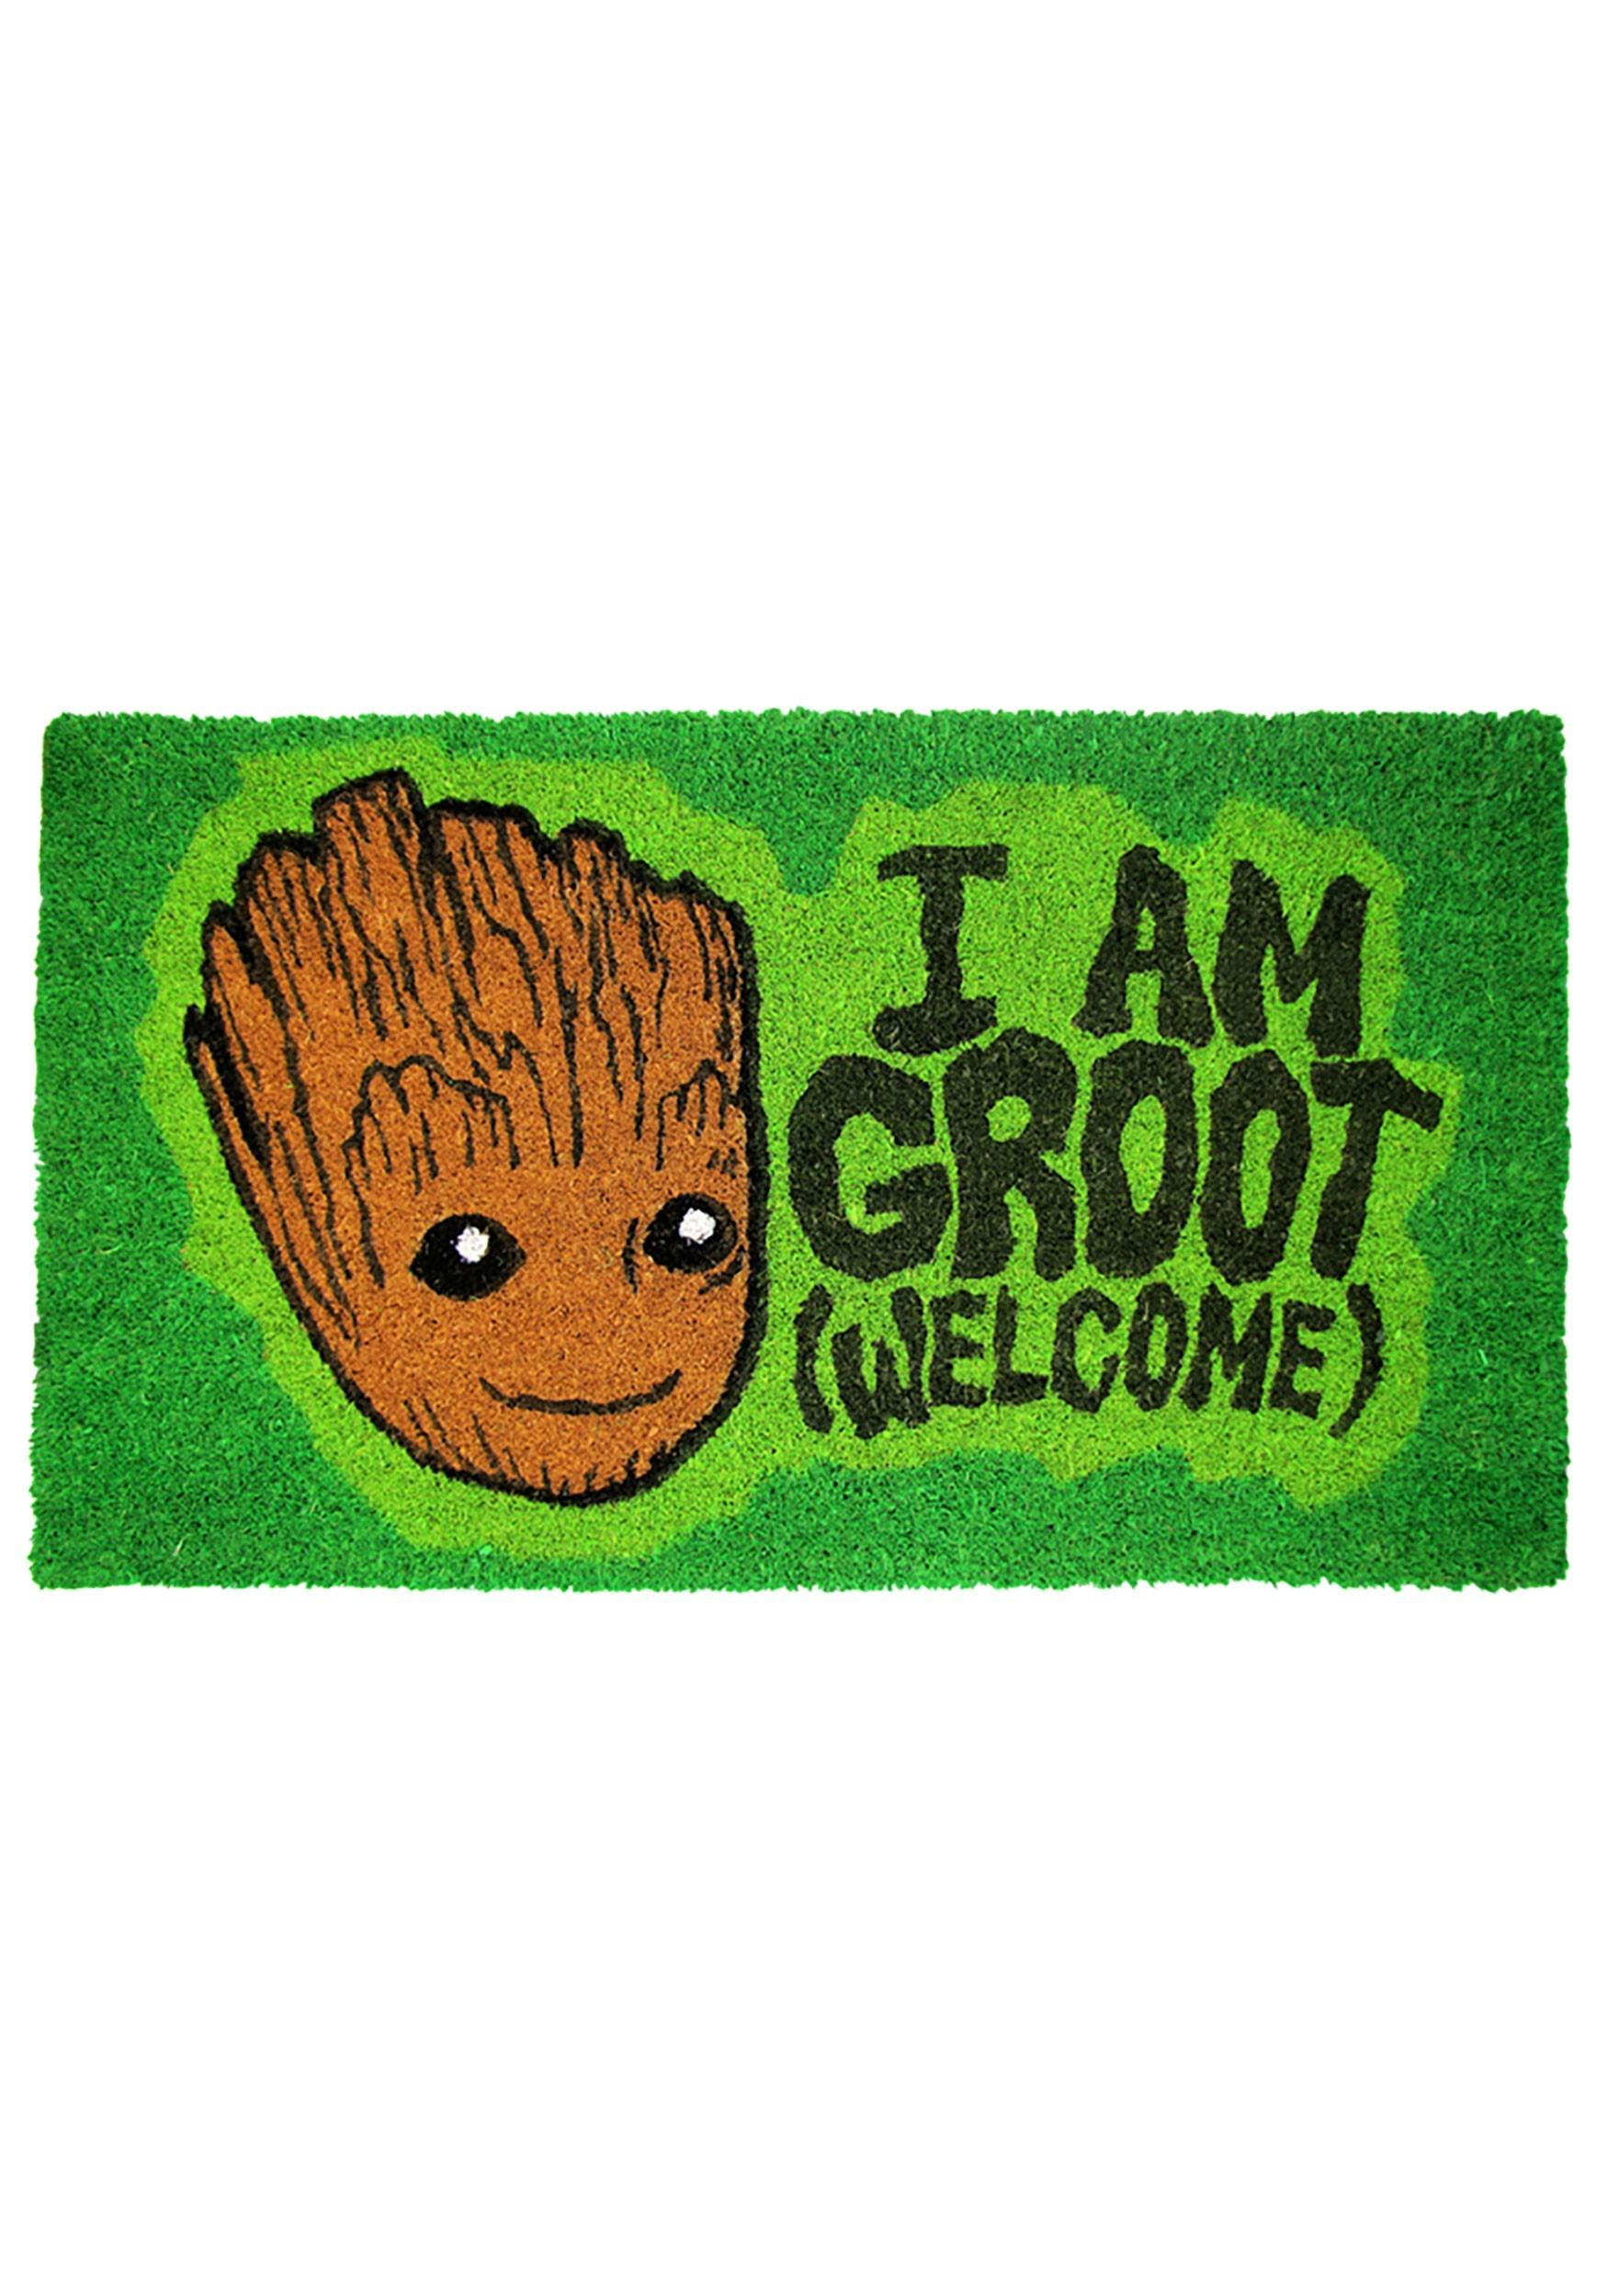 I Am Groot Guardians of the Galaxy Welcome Doormat